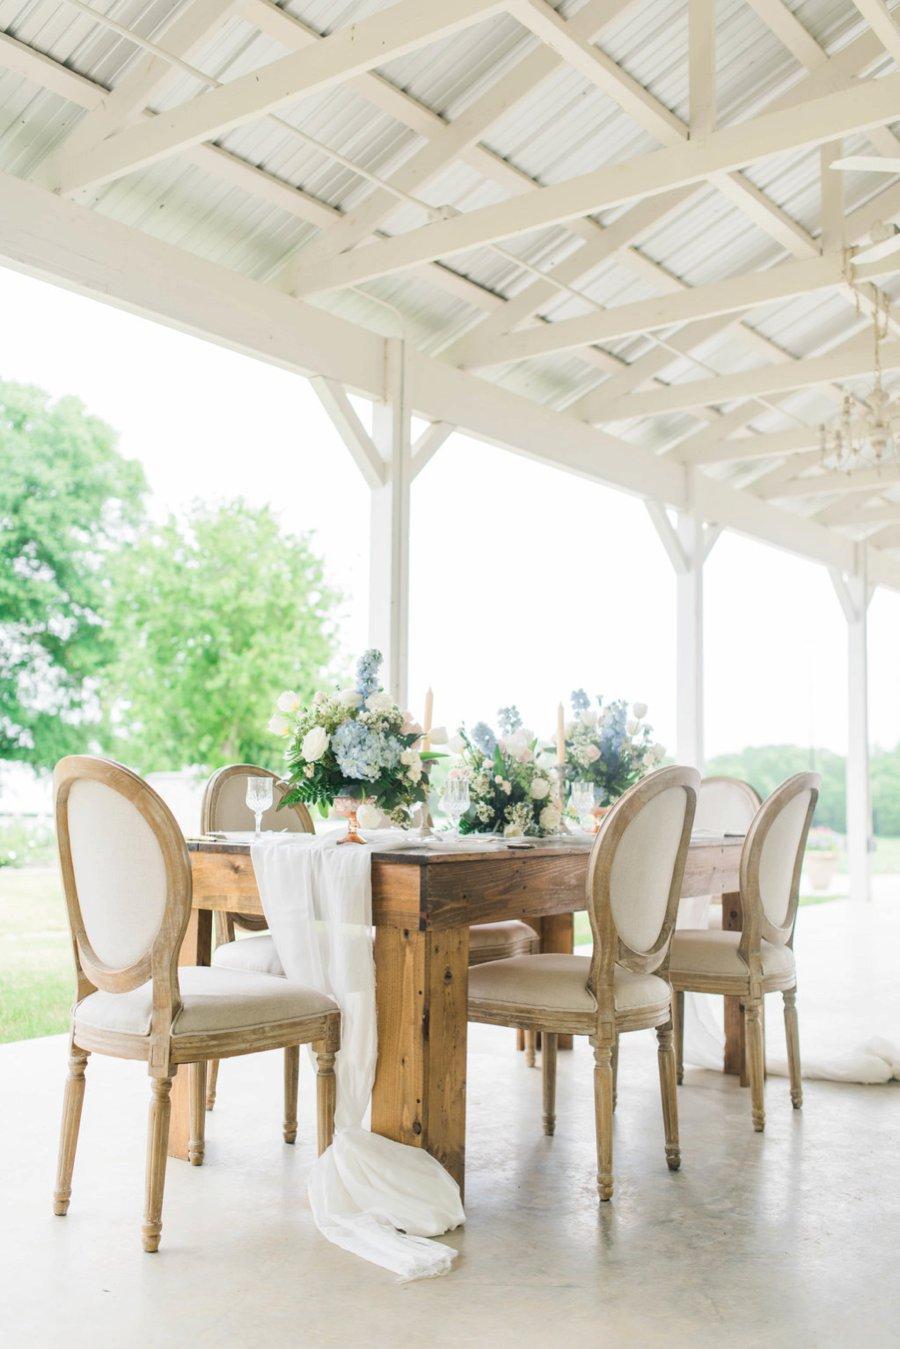 Blush & Blue Rustic Romantic Wedding Ideas via TheELD.com